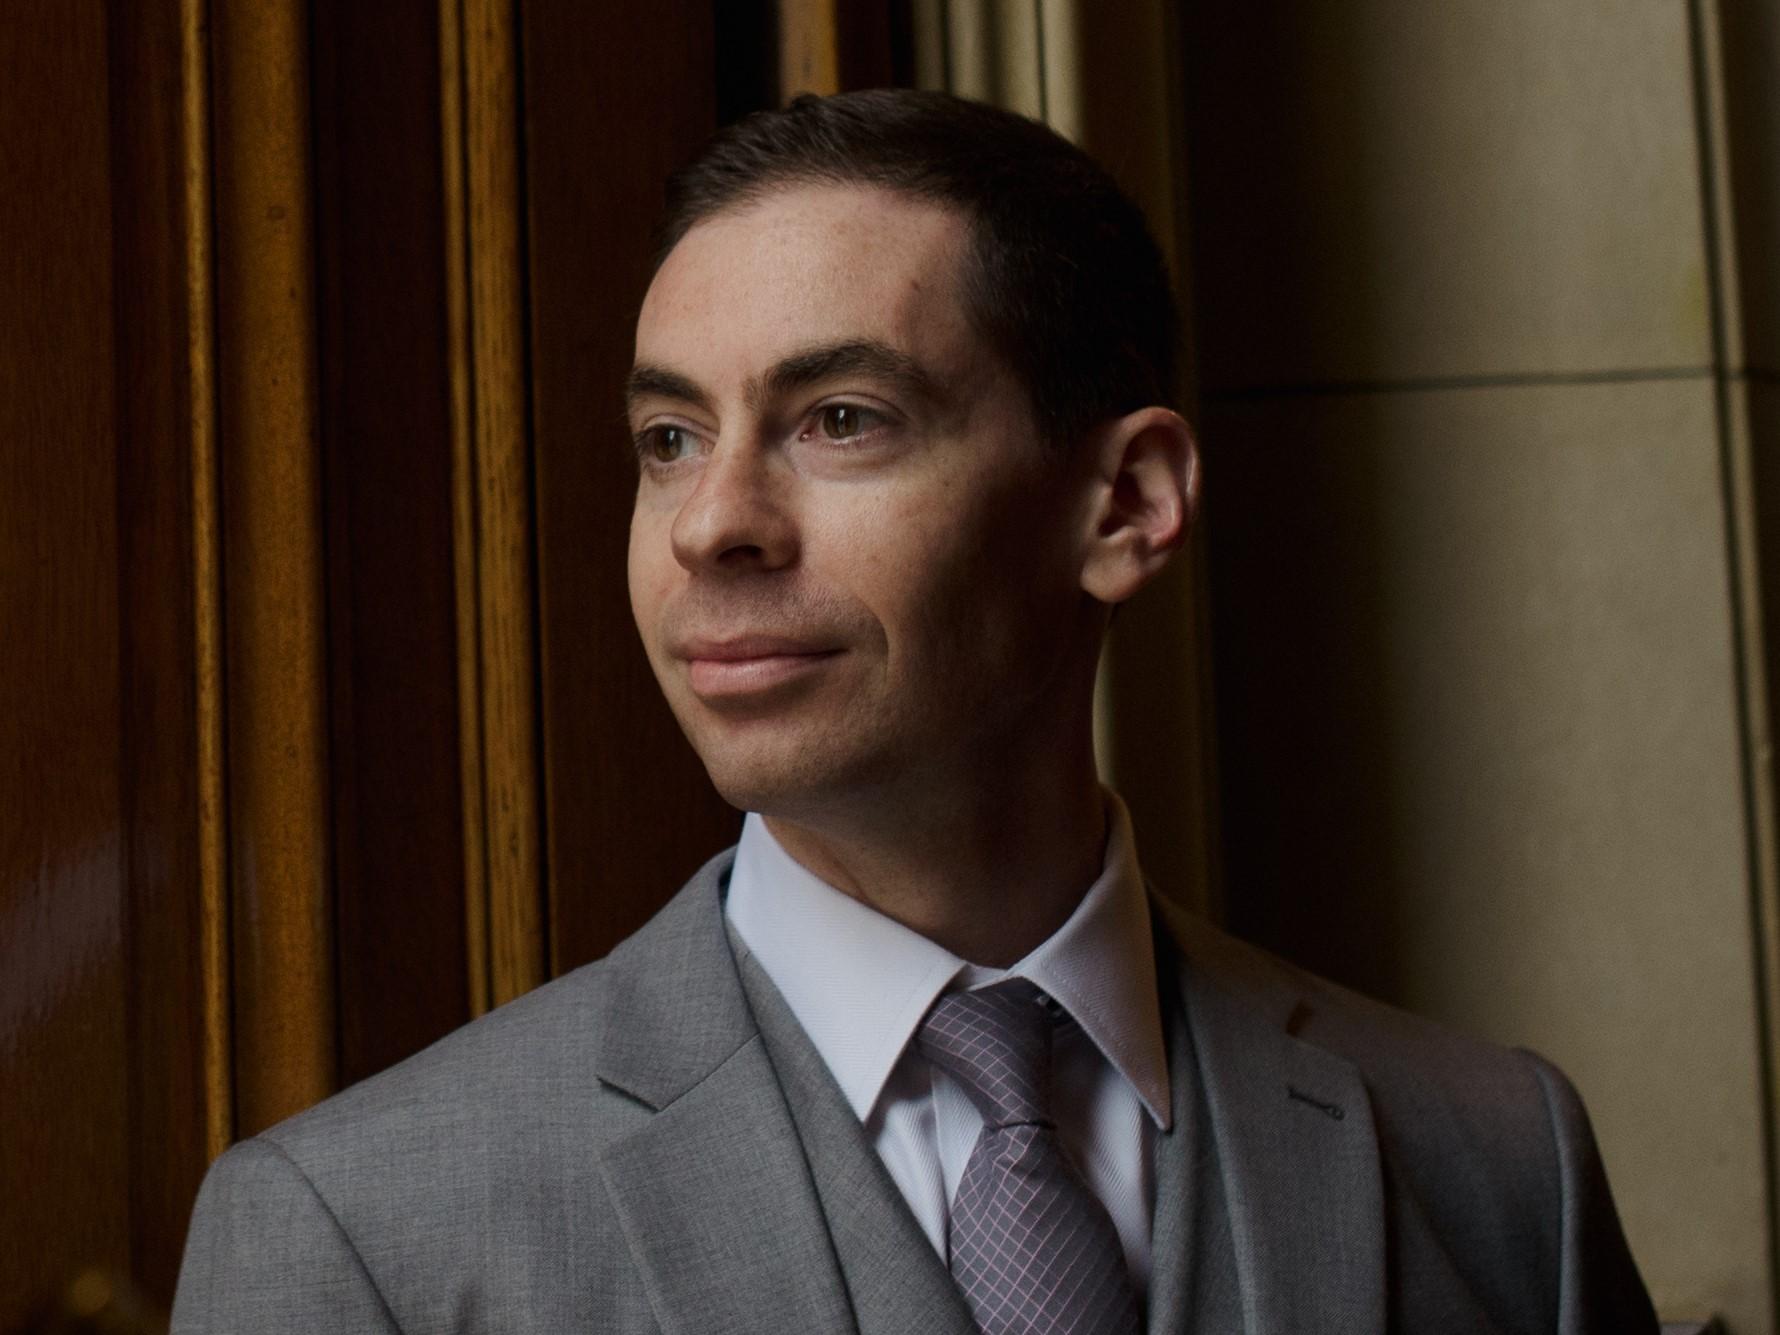 Atlantech Online names Ari Rebach as Director of Network Engineering